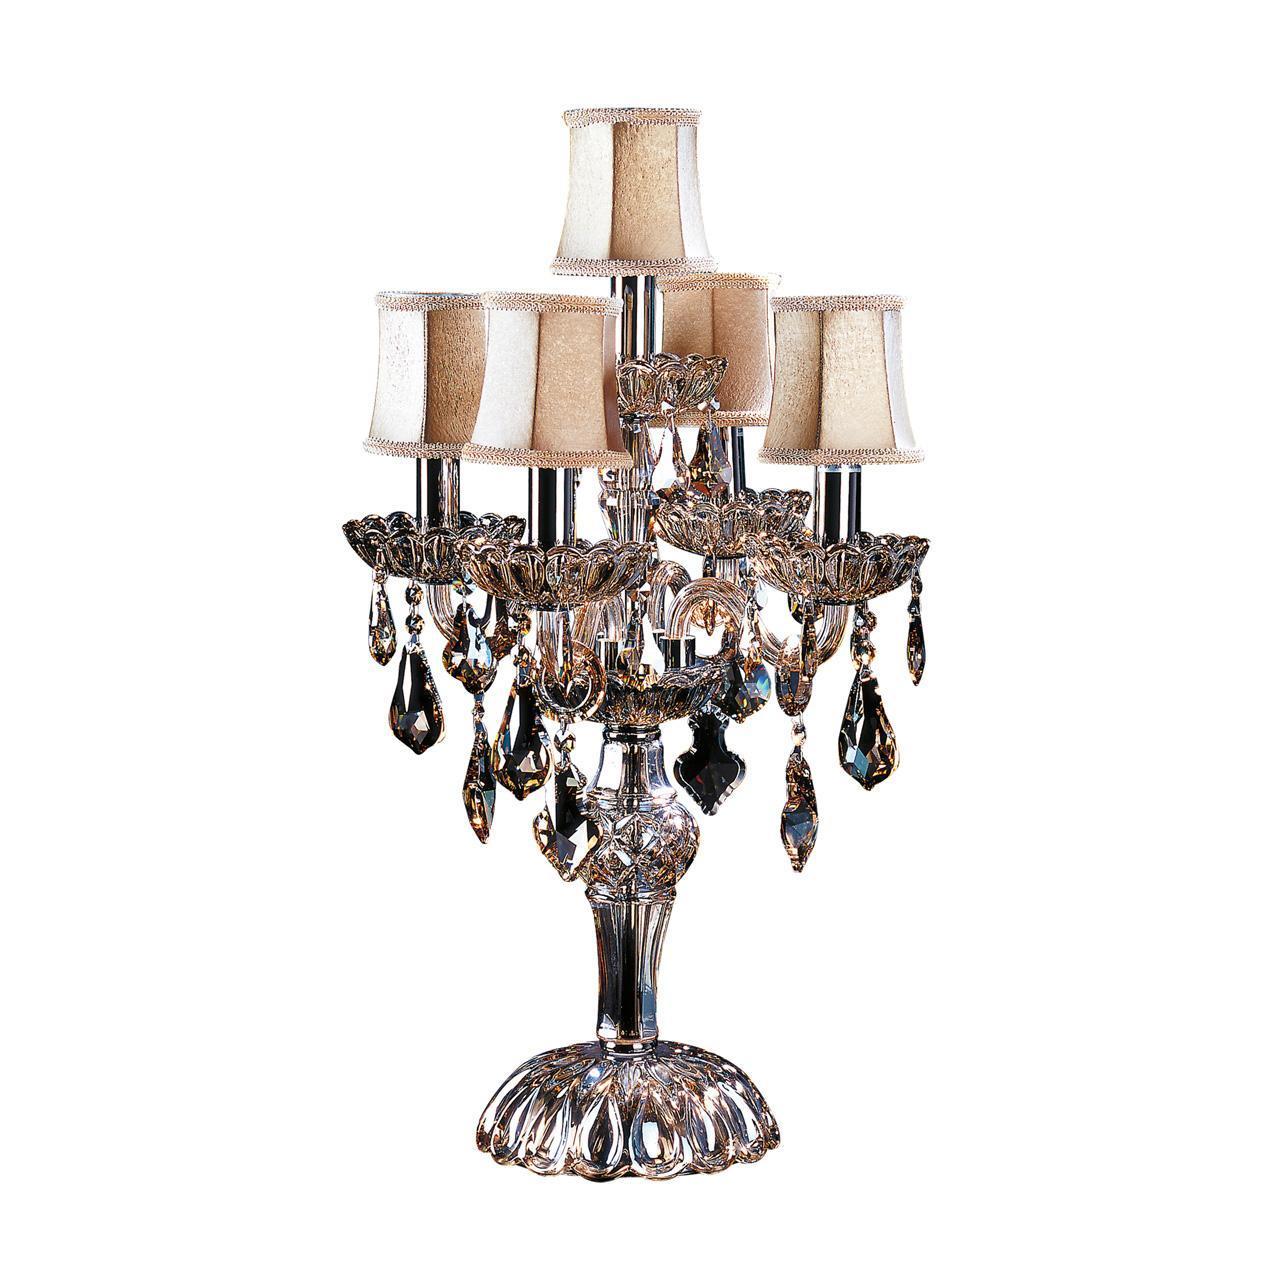 Настольная лампа Osgona Nativo 715957